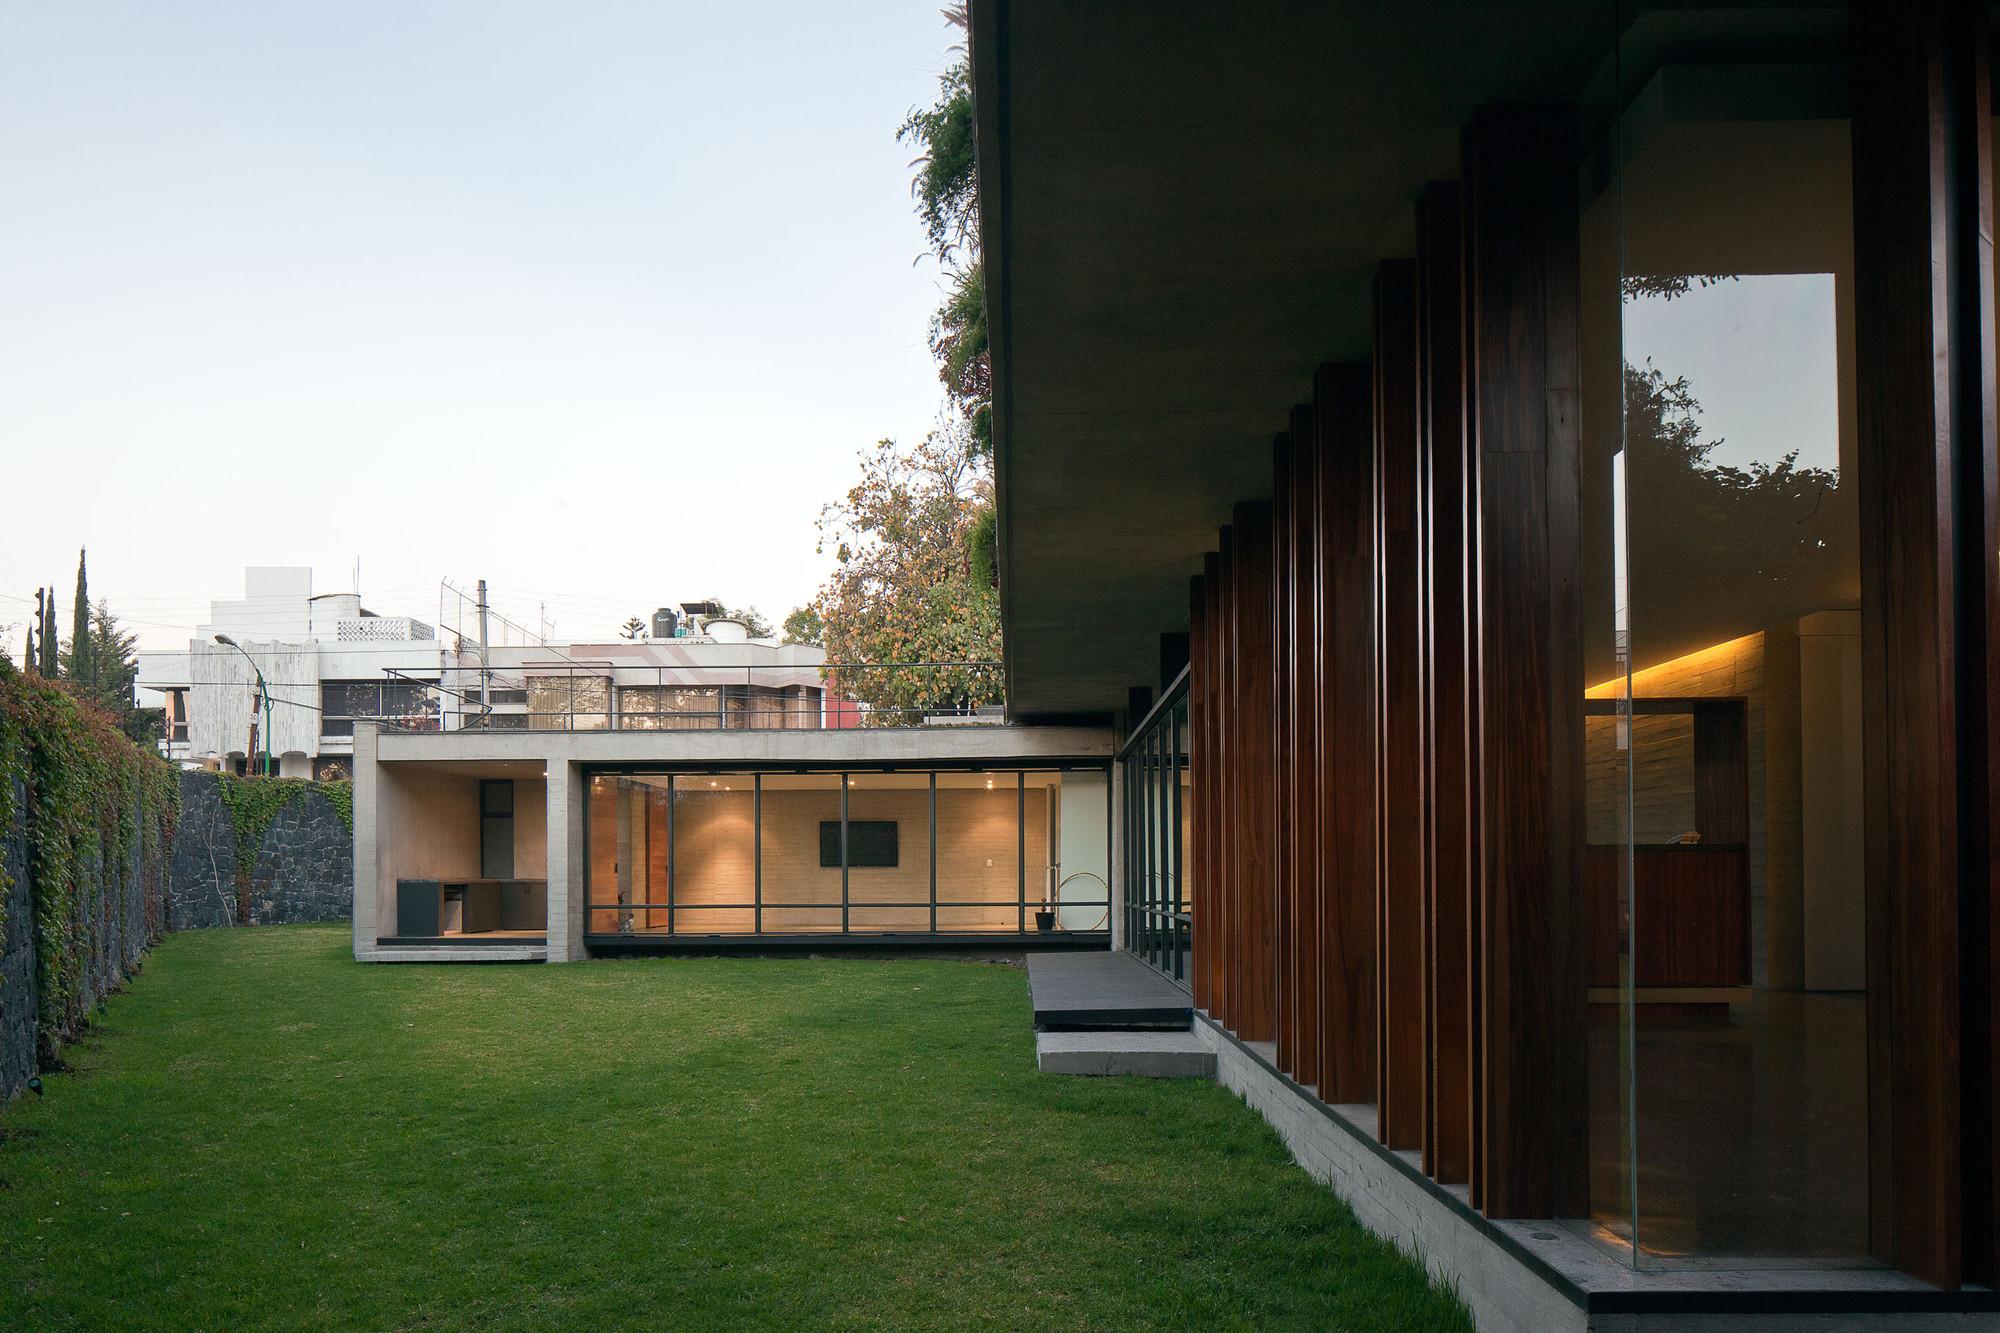 Fuentes House / DMP Arquitectura, © Onnis Luque